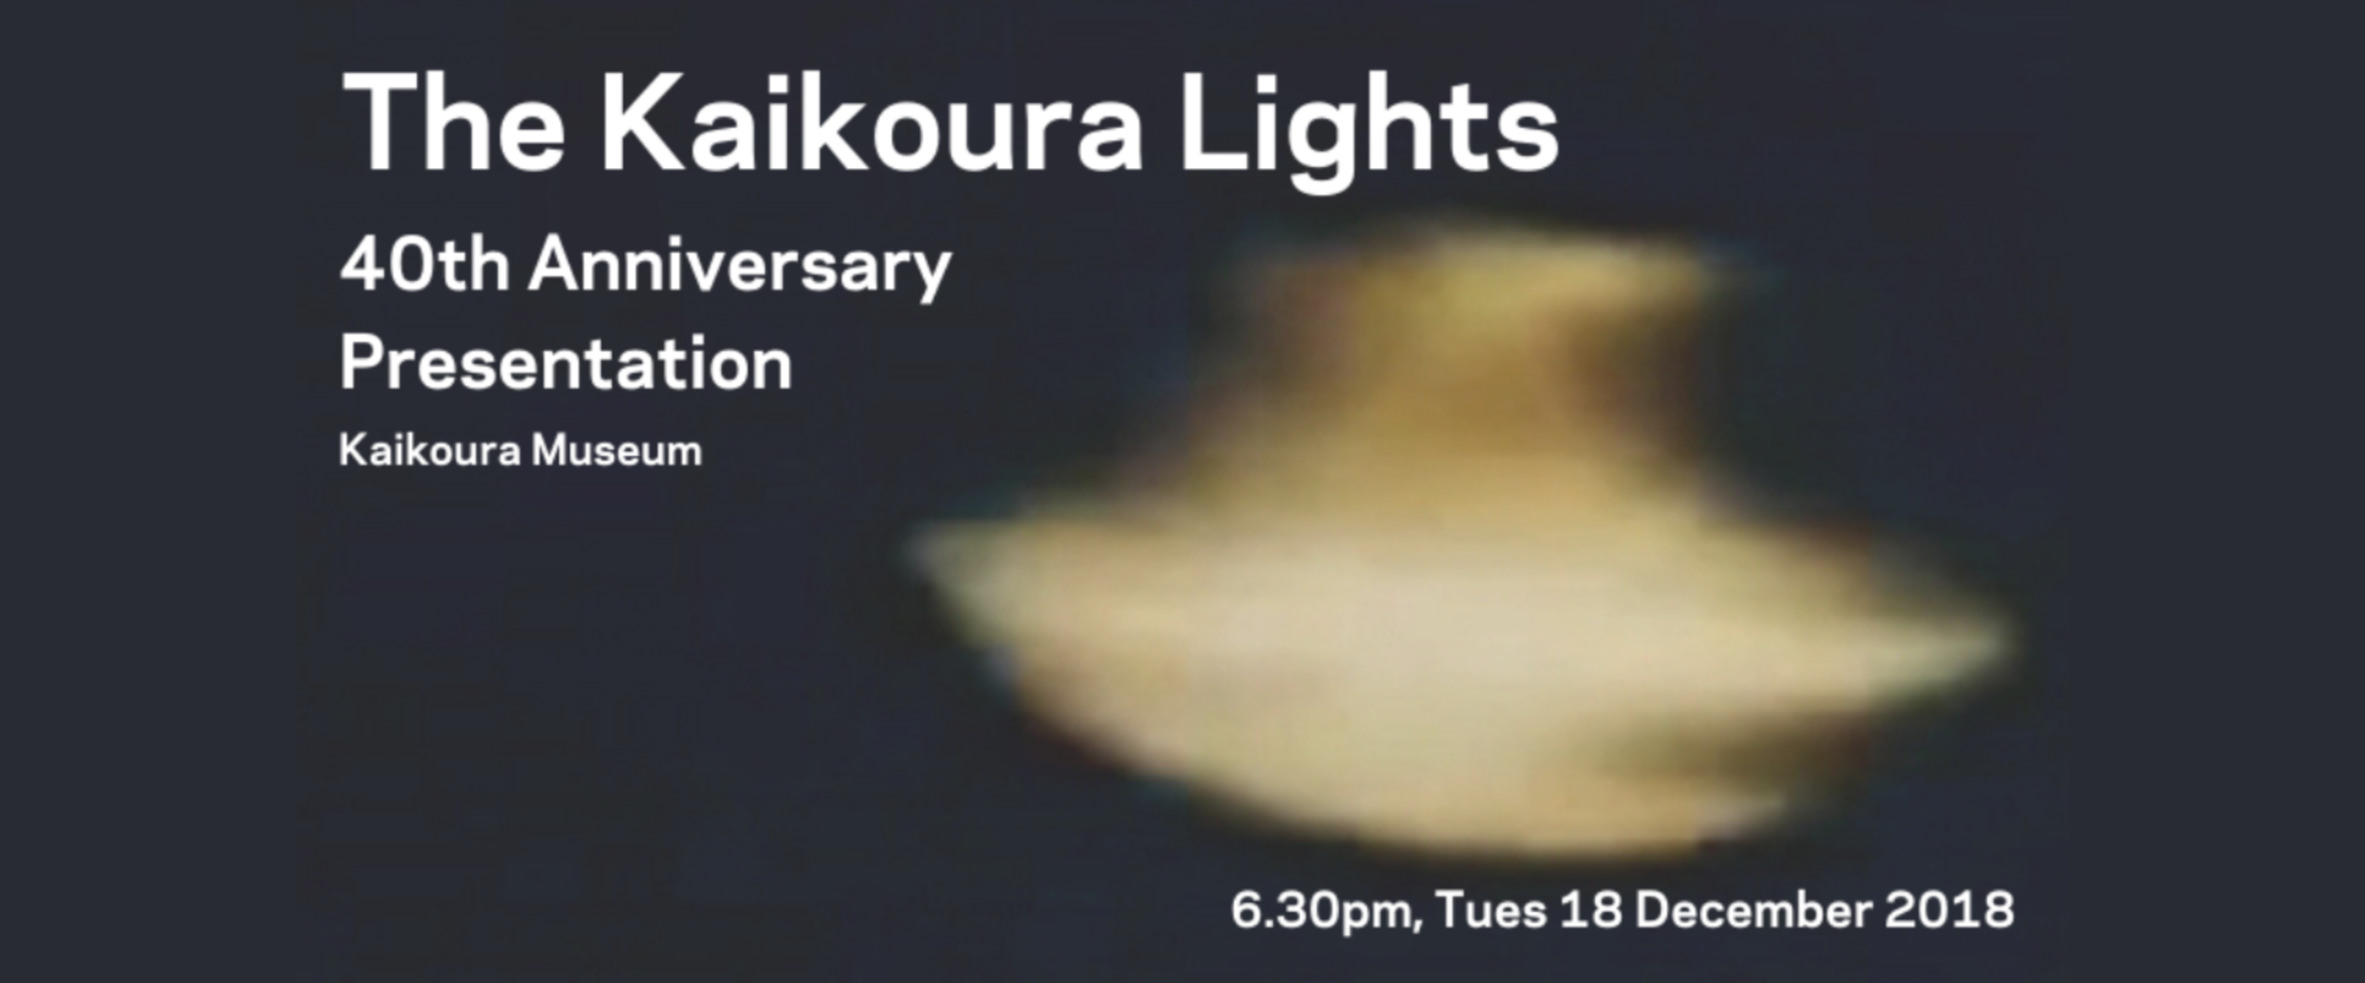 kaikoura-lights-40th-Anniversary-Presentation